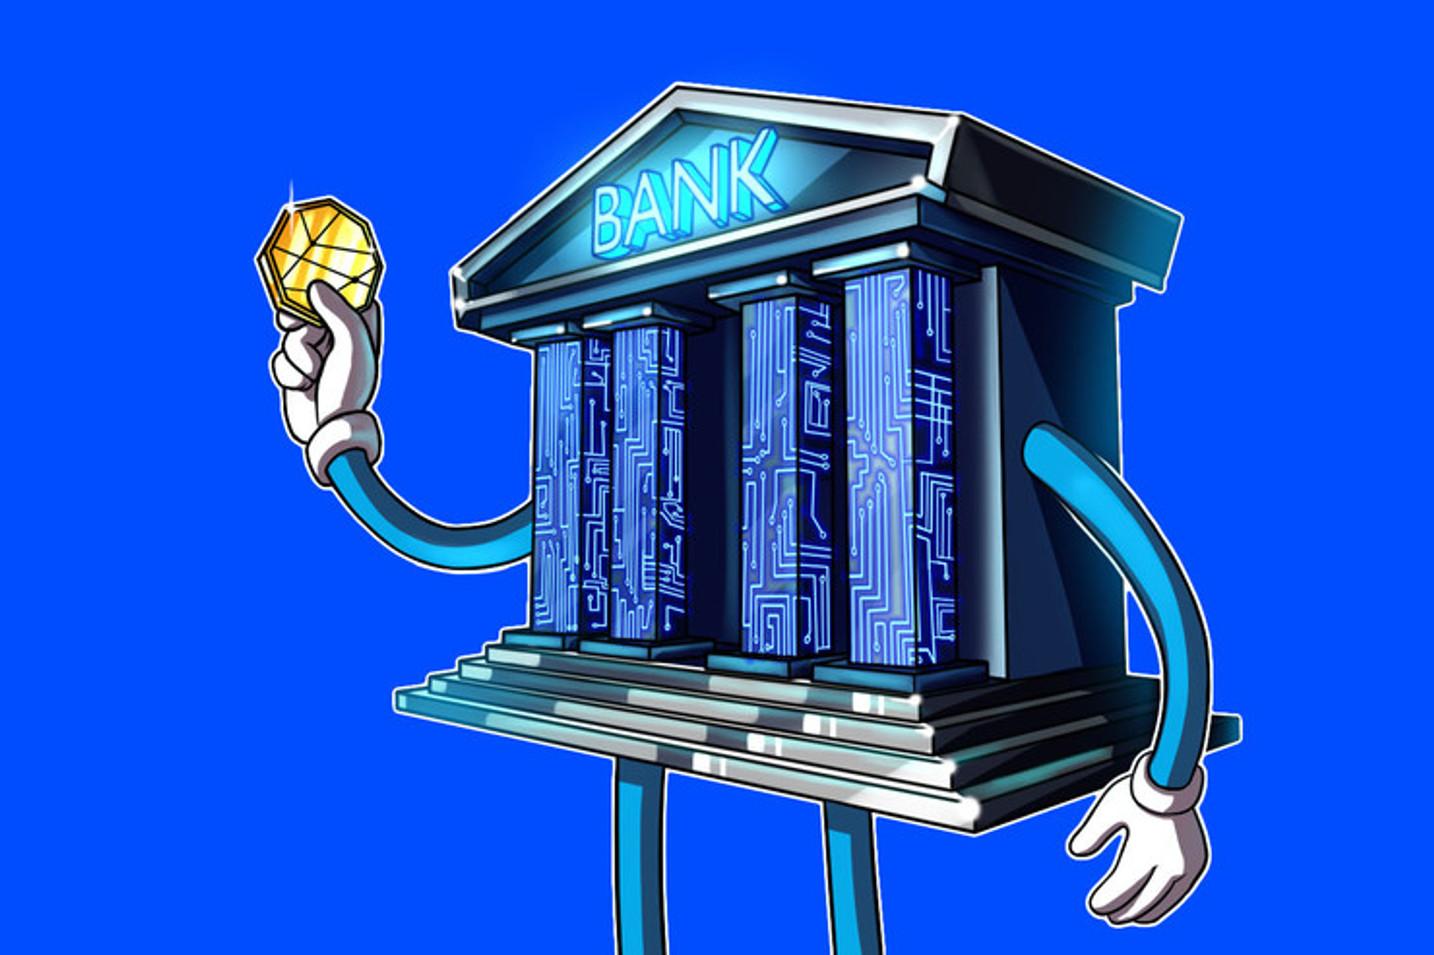 Economista e Chefe do Banco Central do Brasil falará em curso sobre Bitcoin, tokens e stablecoins